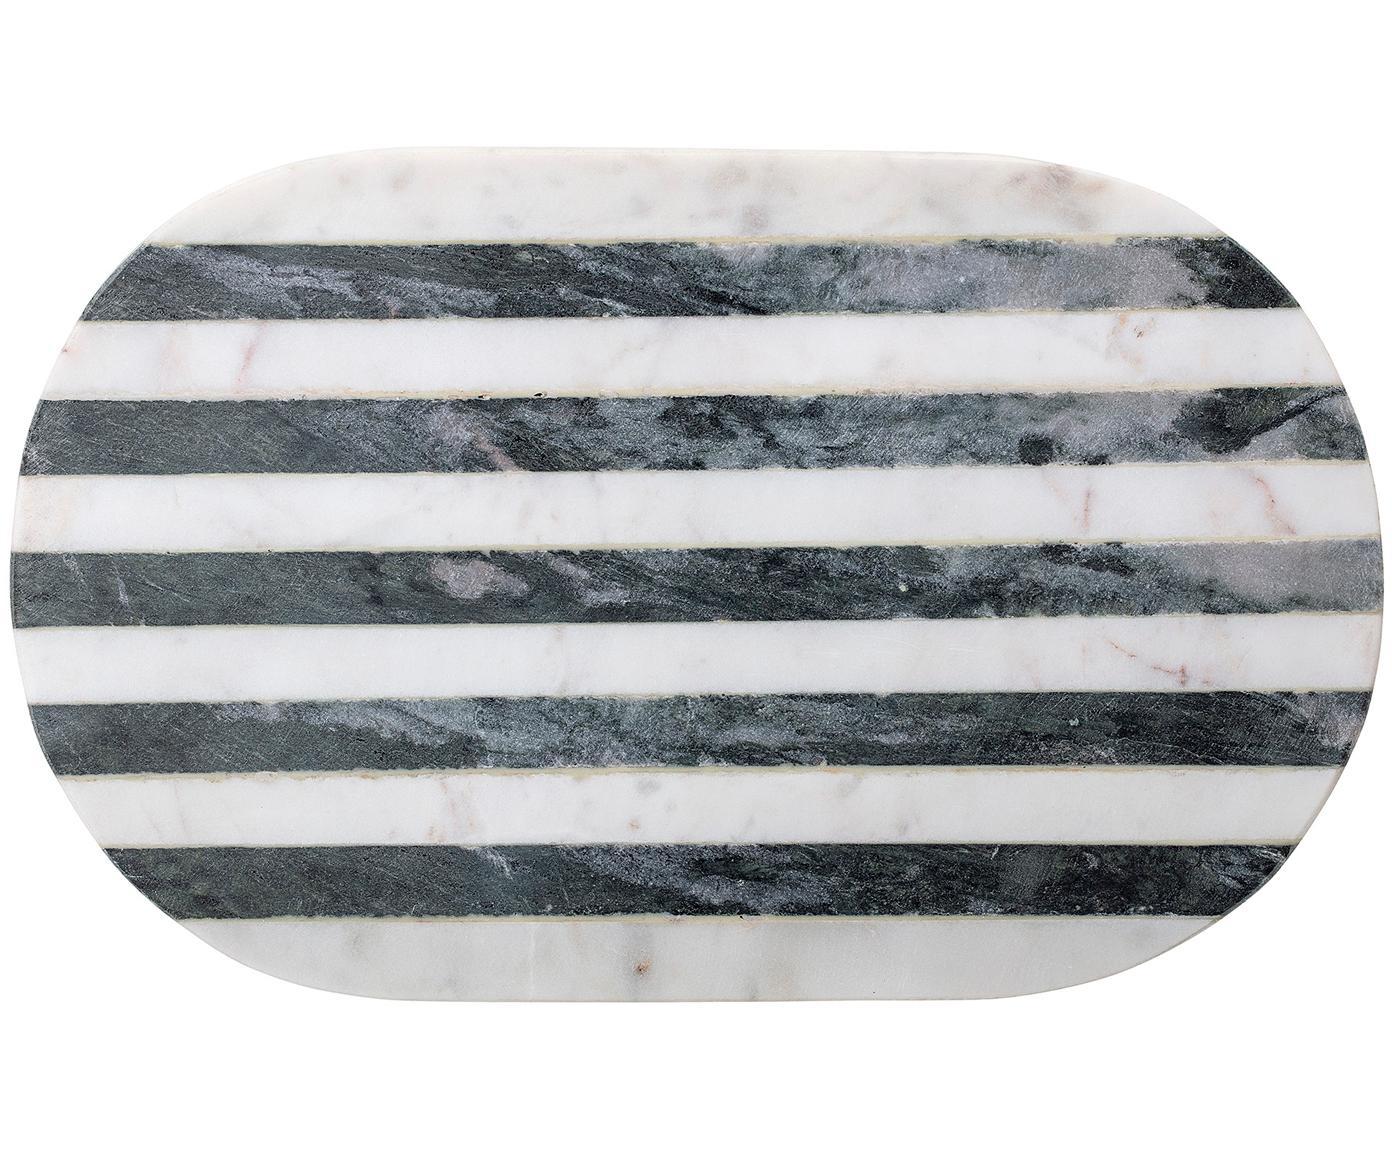 Tagliere in marmo Stripes, Marmo, Nero, bianco, Larg. 37 x Prof. 23 cm